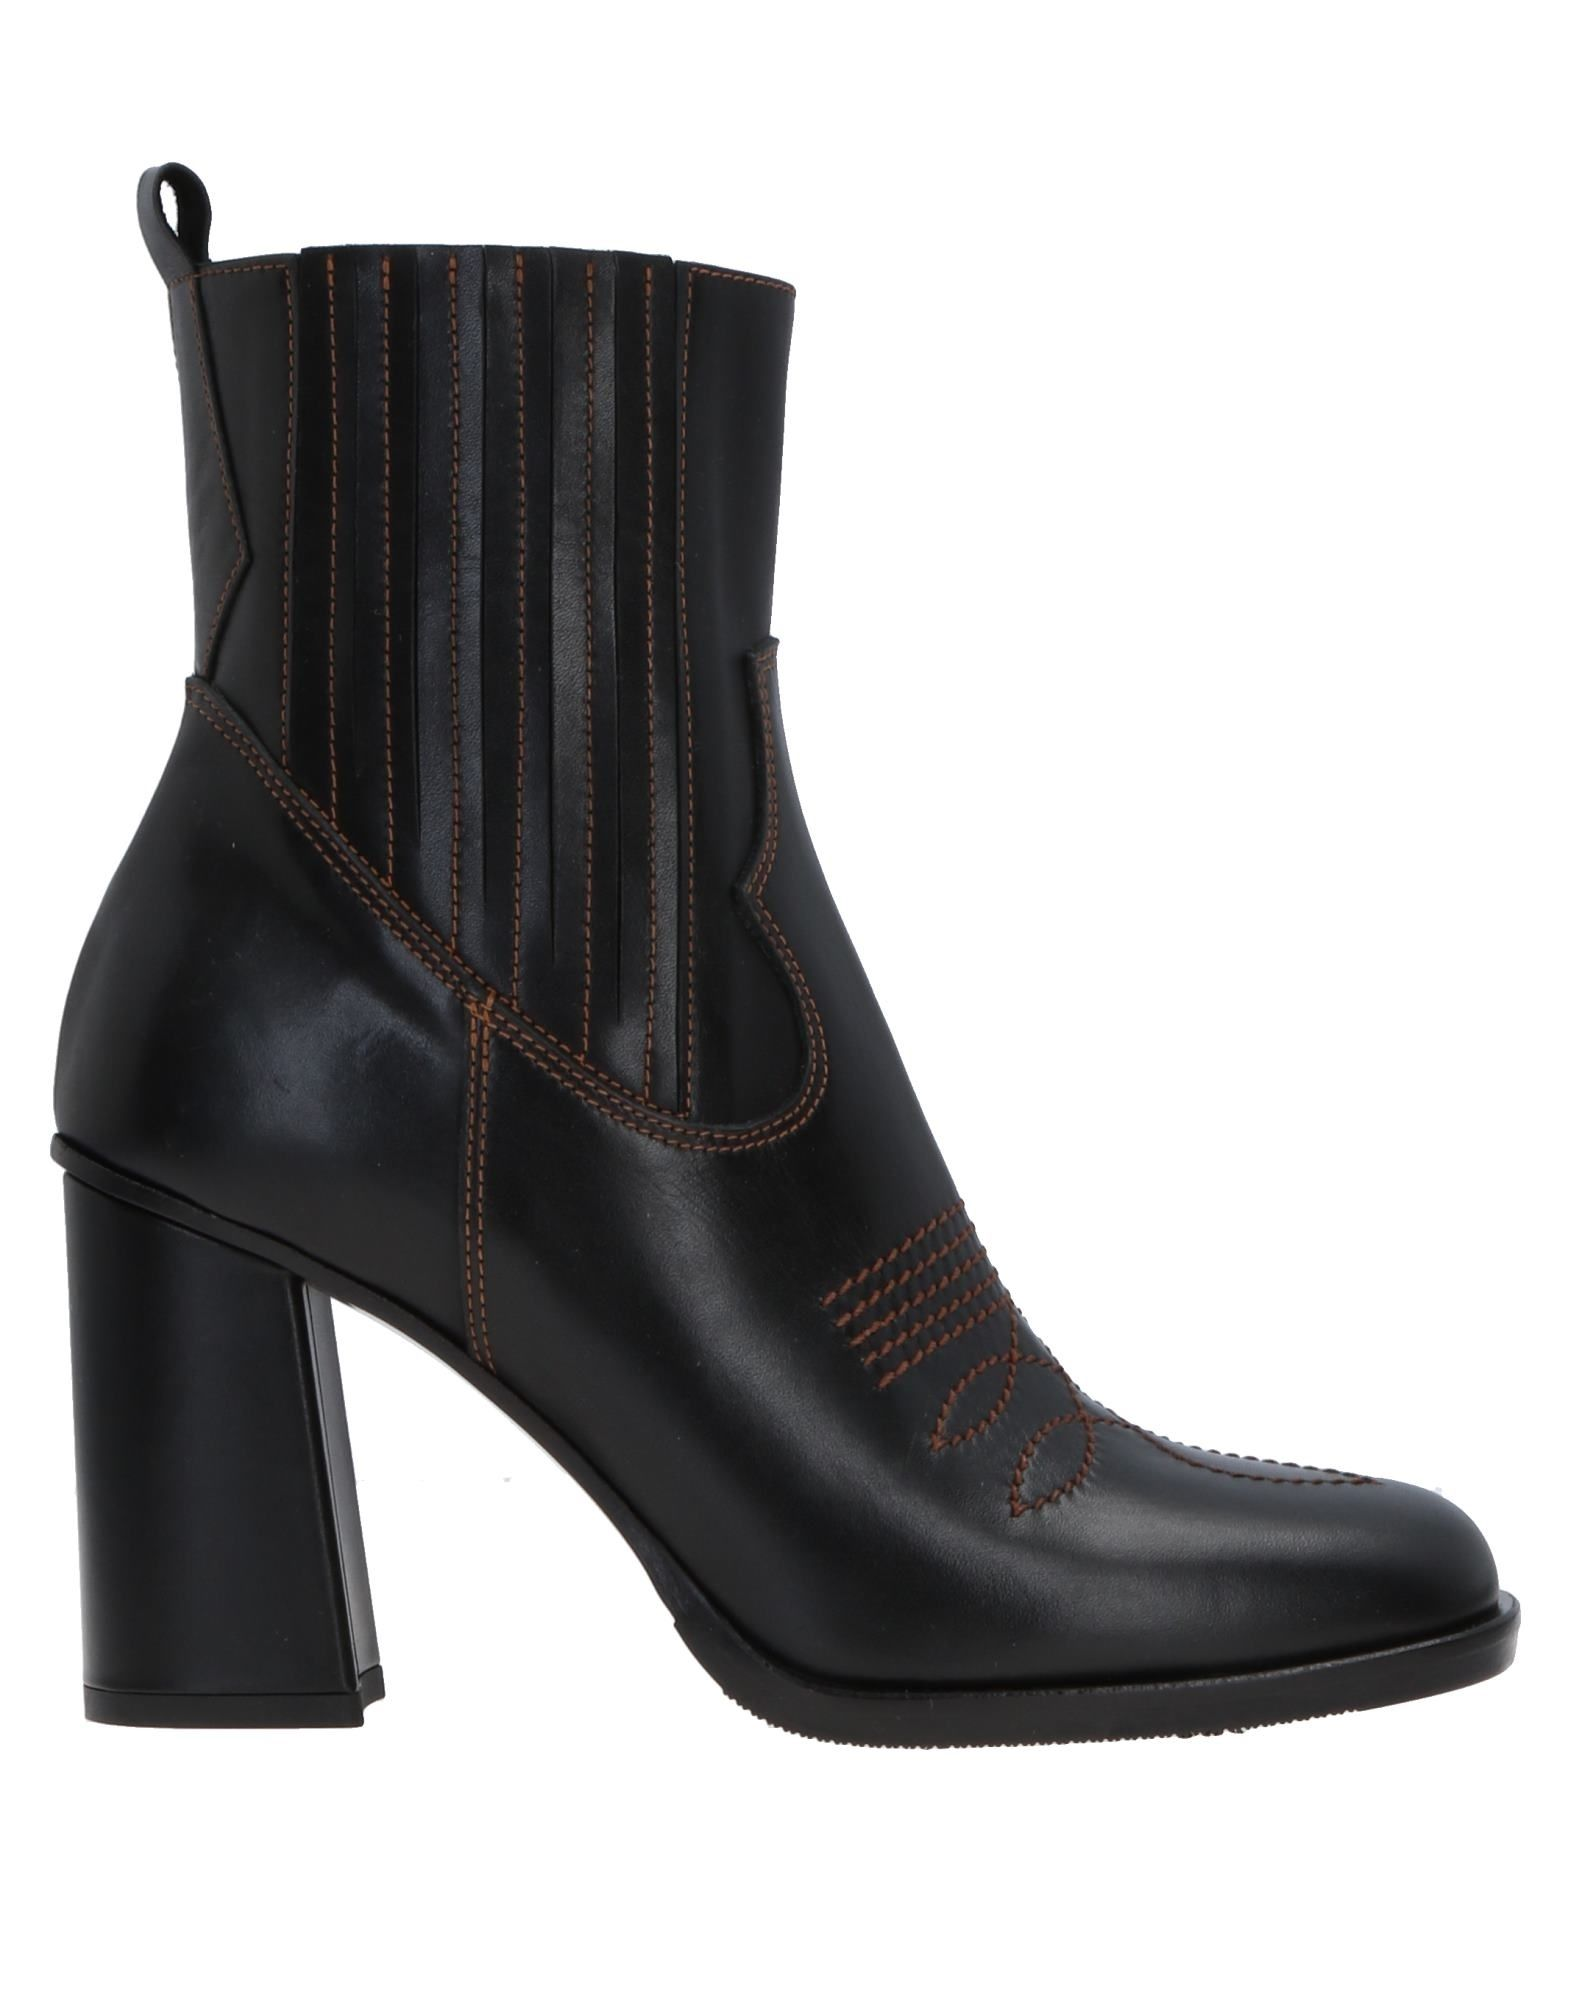 F.Lli Bruglia Ankle Bruglia Boot - Women F.Lli Bruglia Ankle Ankle Boots online on  Australia - 11518413CJ f9df1e